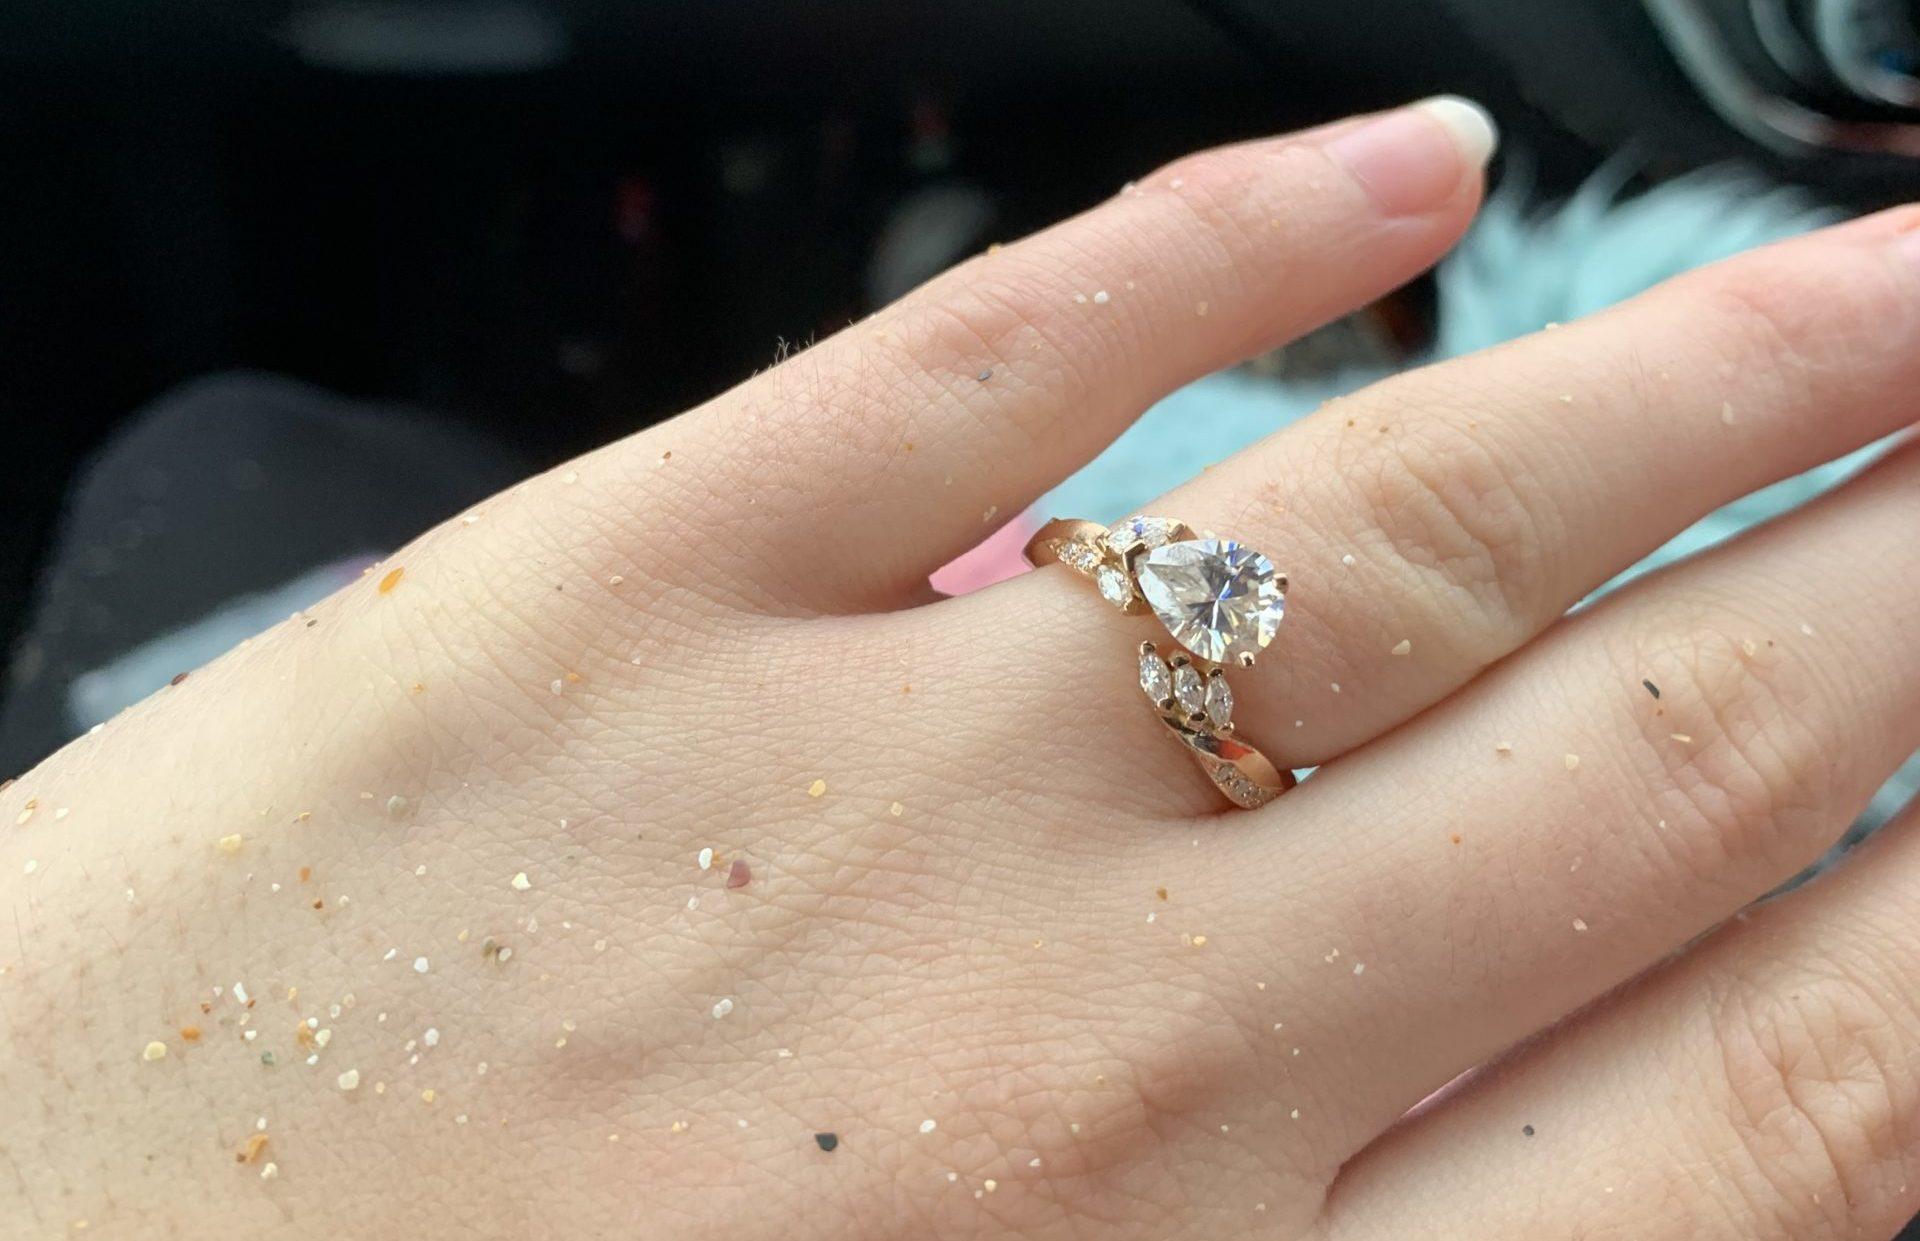 The bespoke ring on Nikki's sandy hand